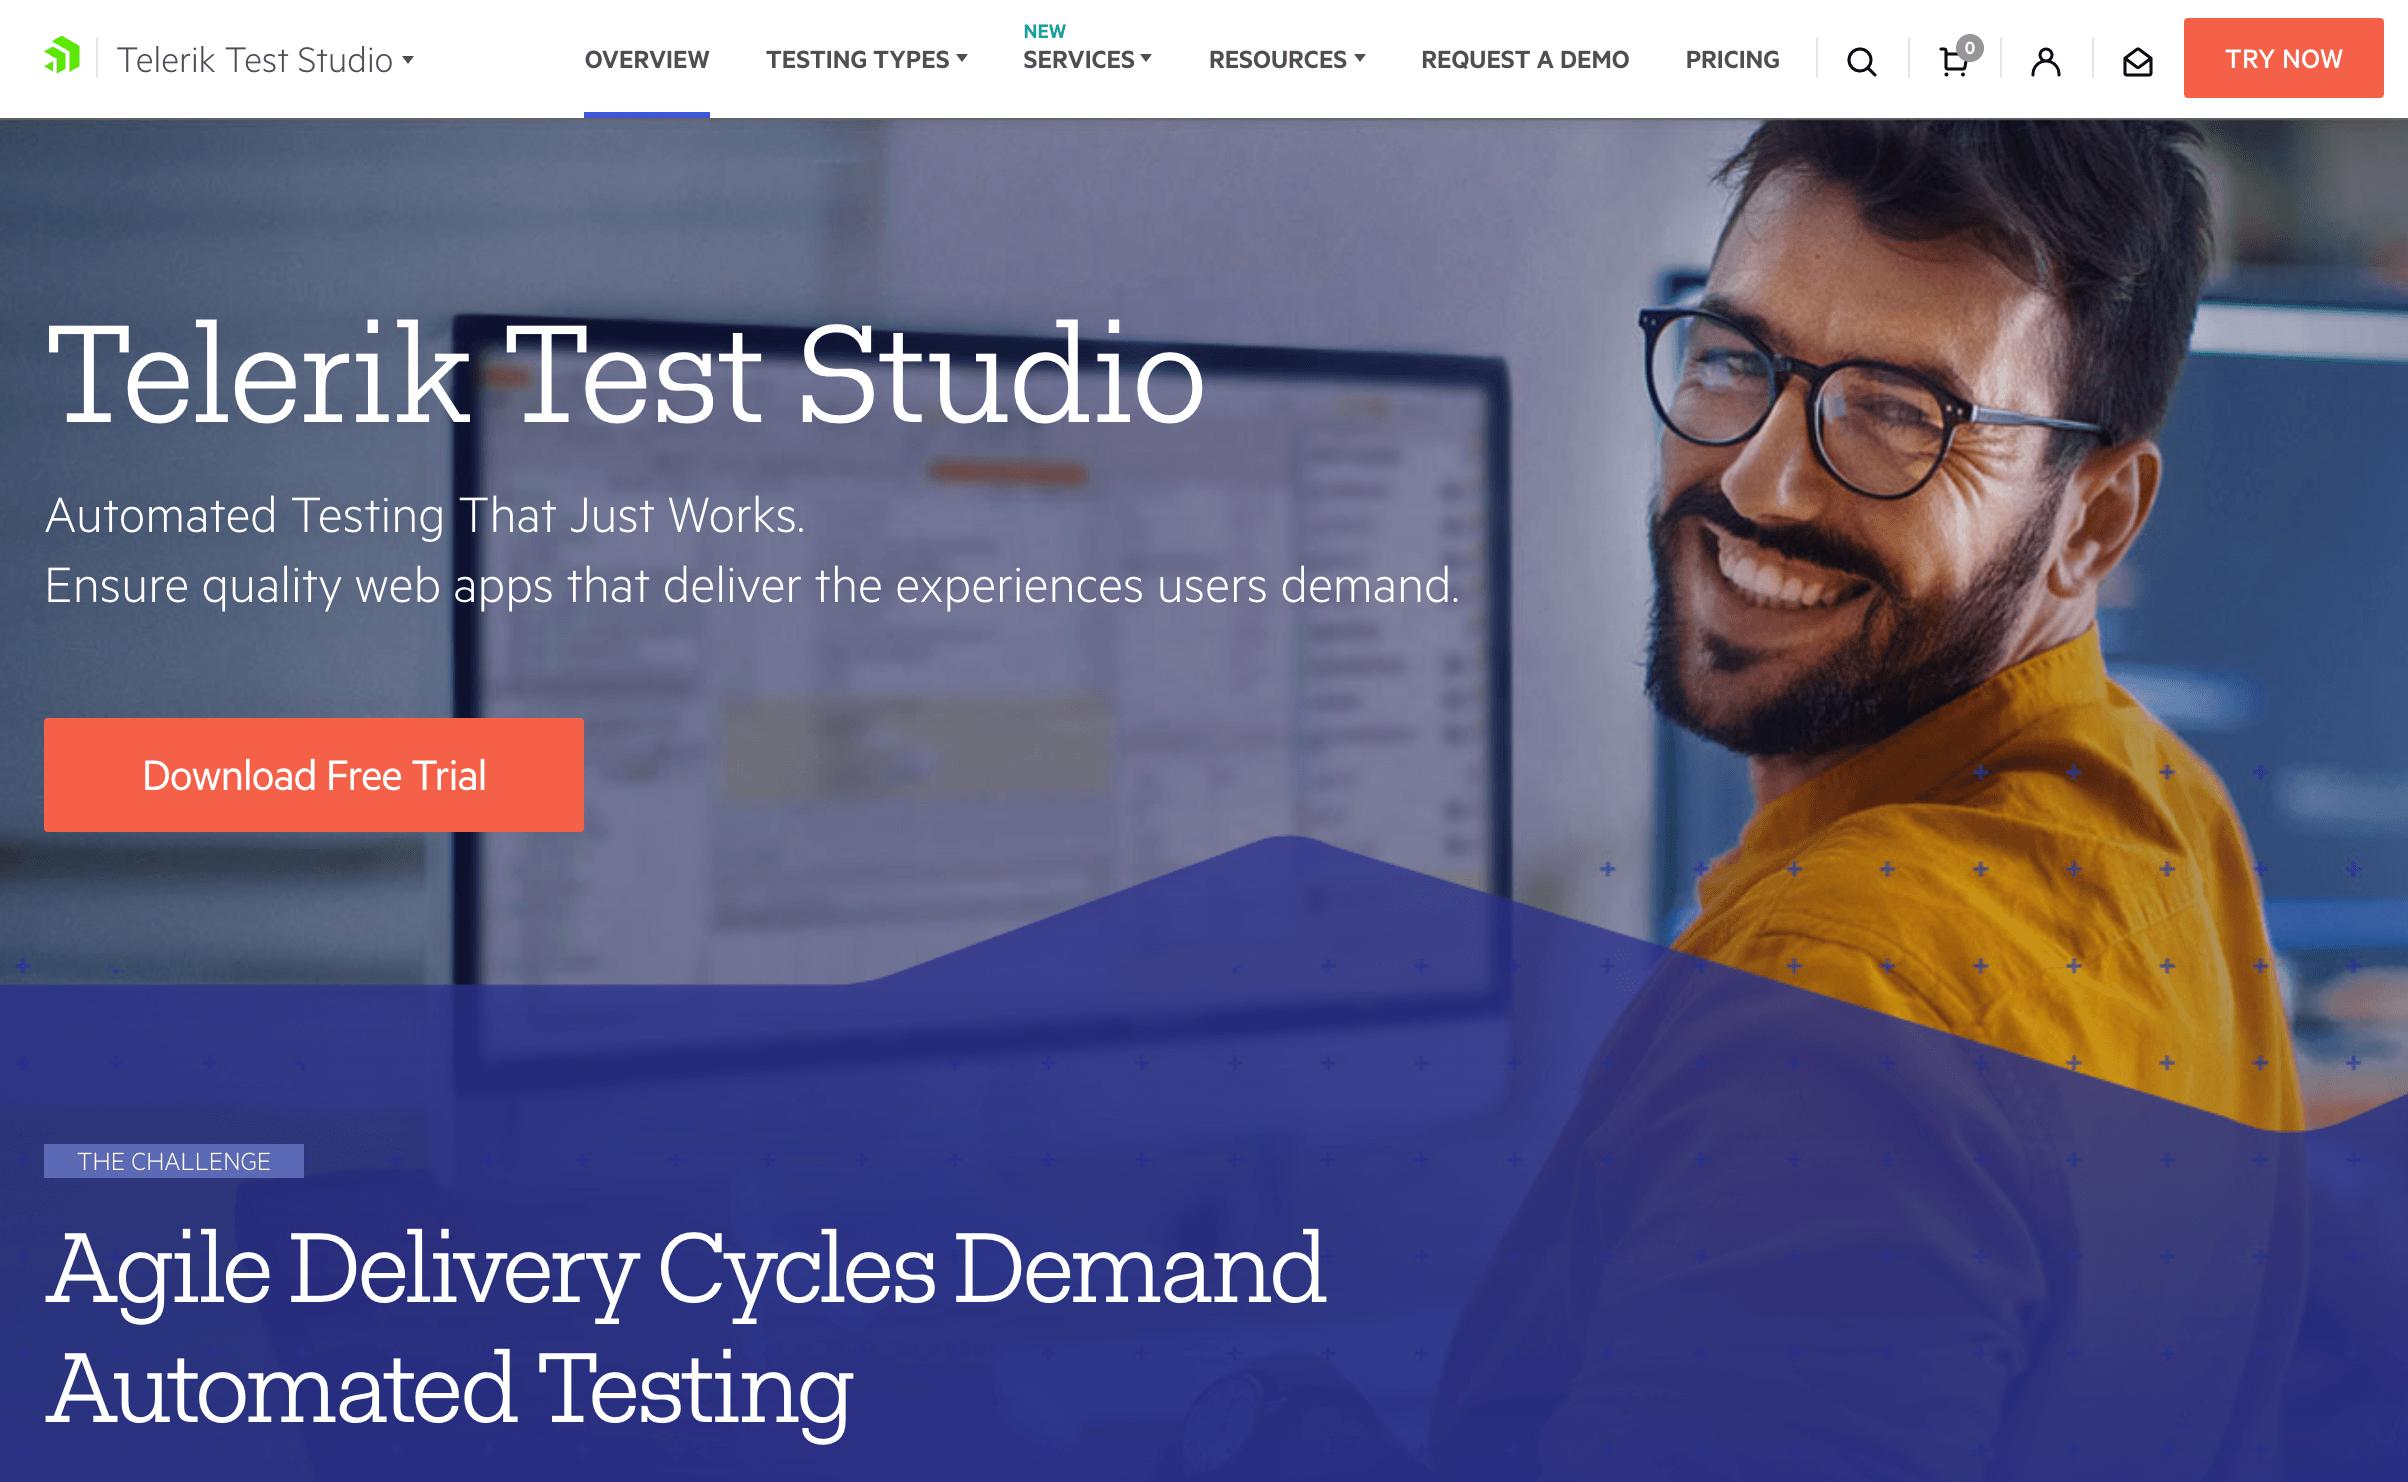 Telerik Test Studio